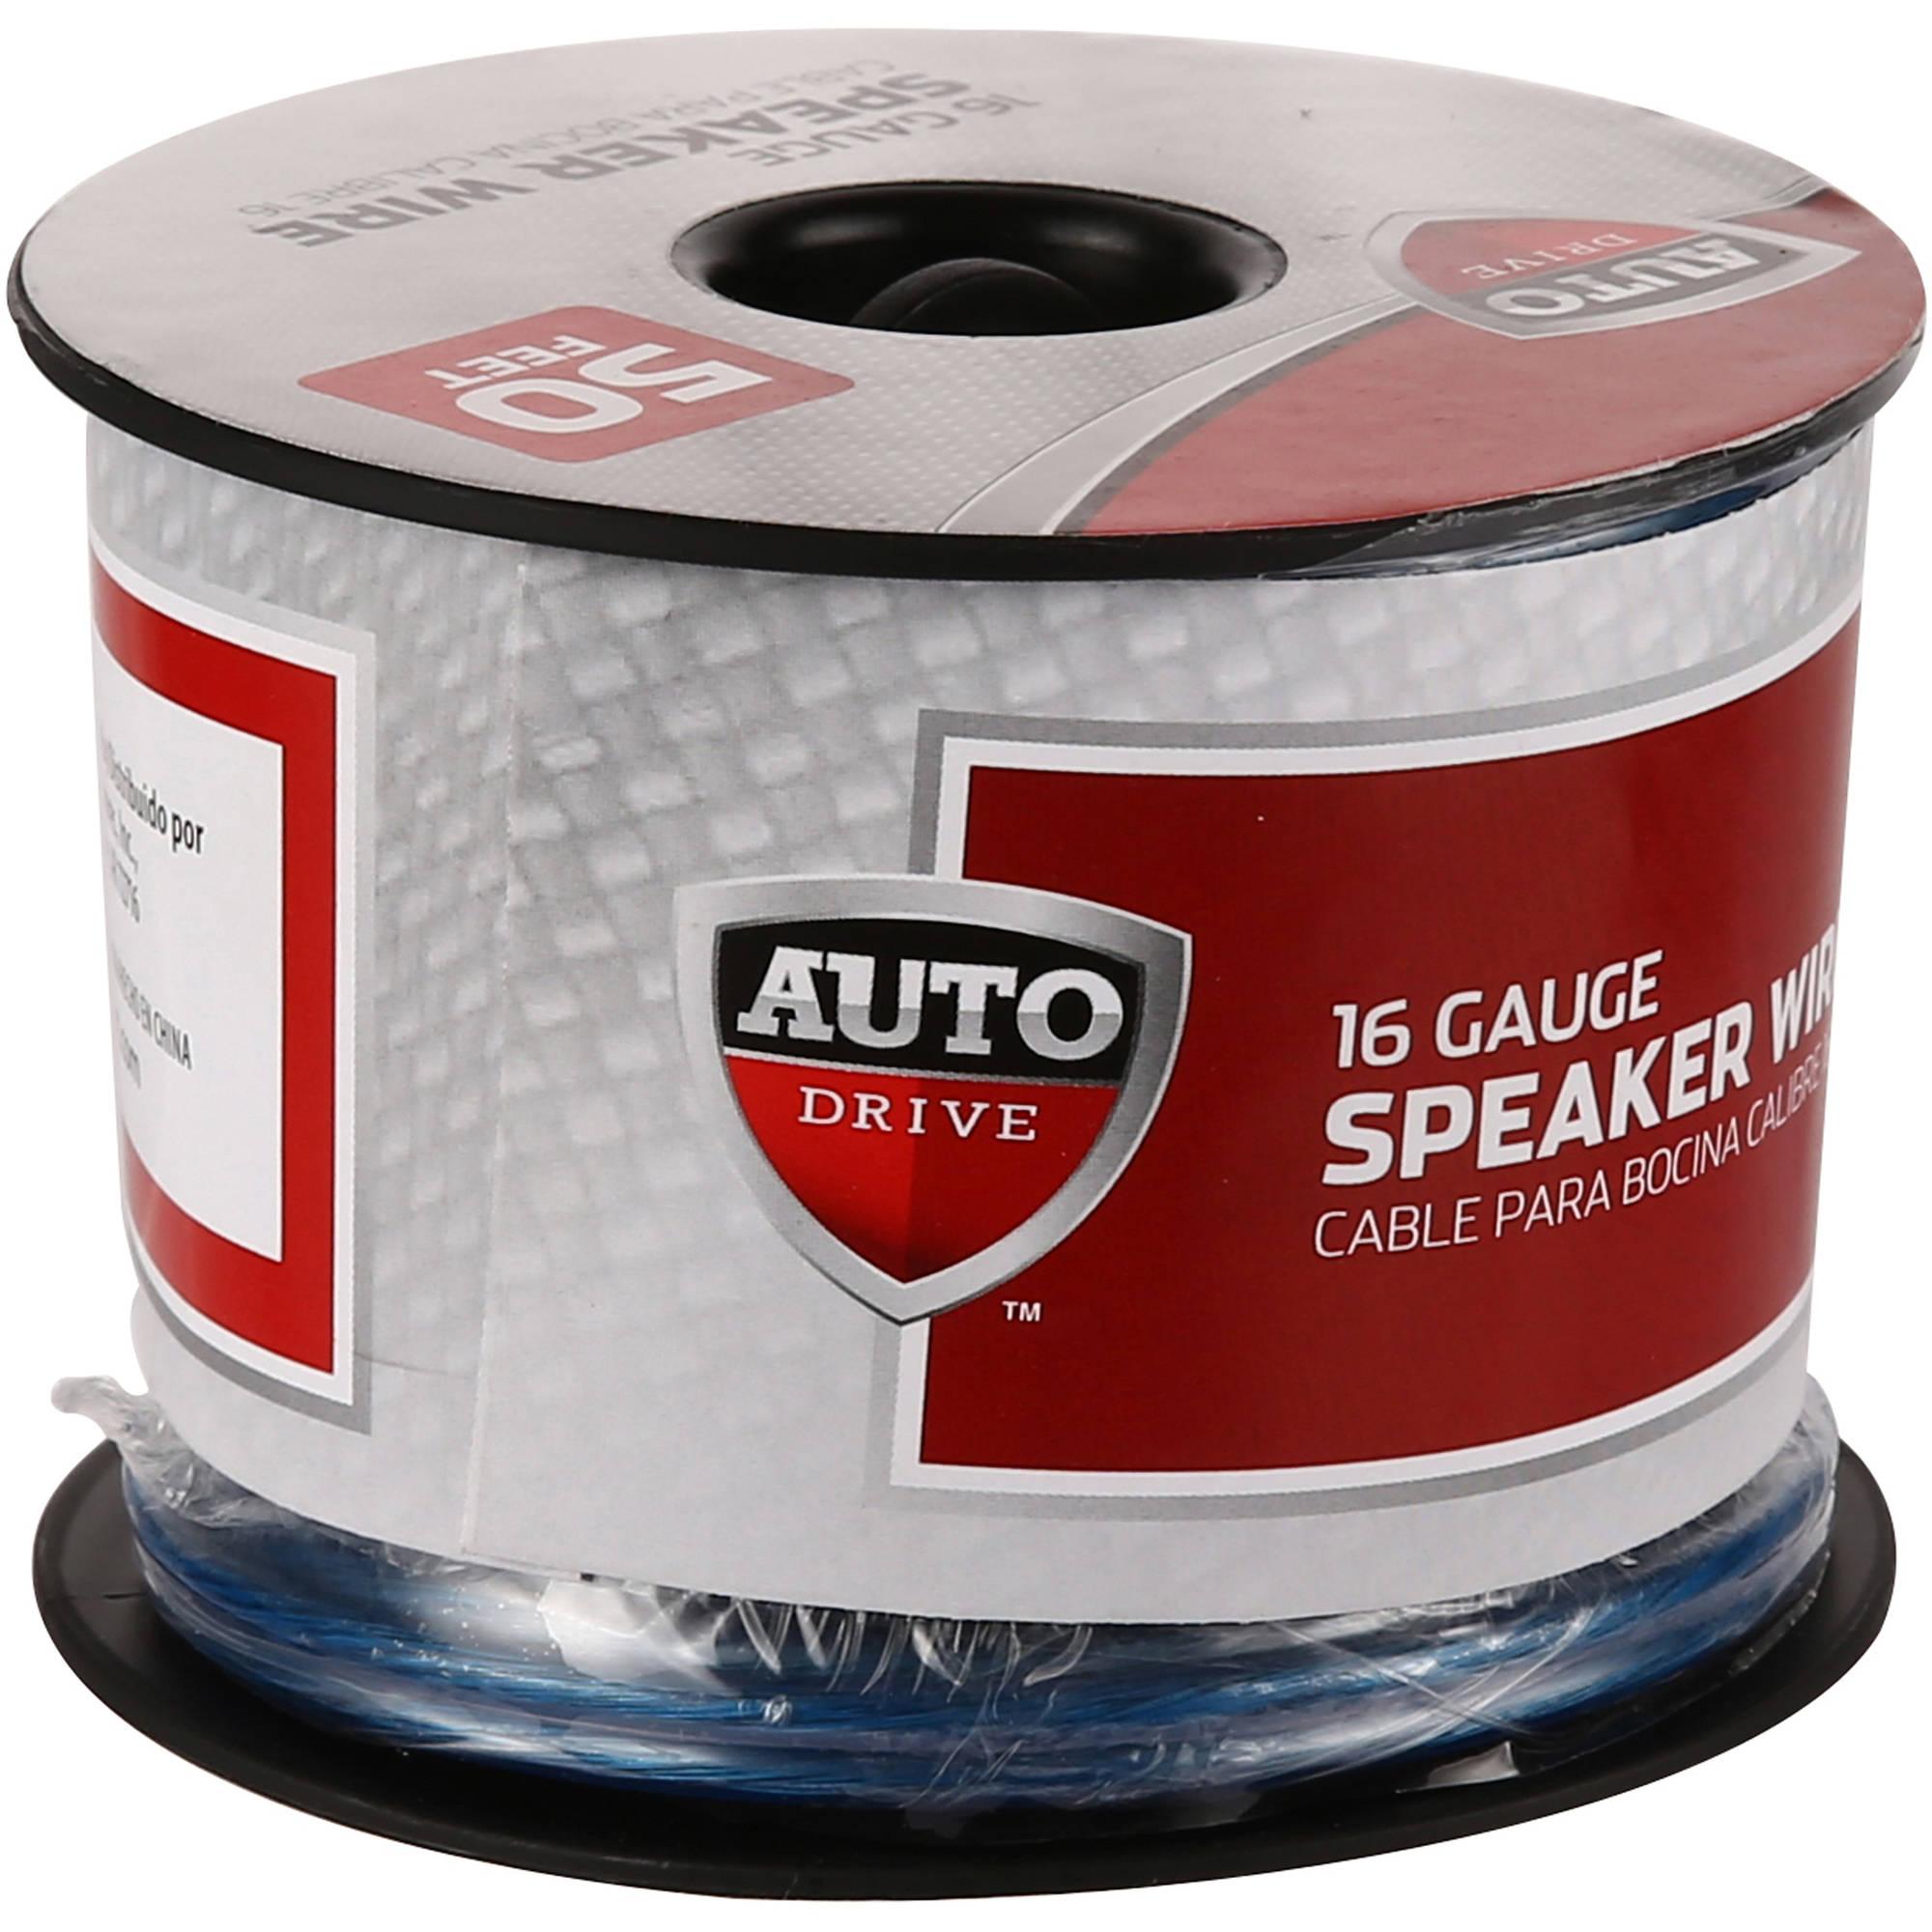 Auto Drive 16ga Speaker Wire 50 Feet $1.95